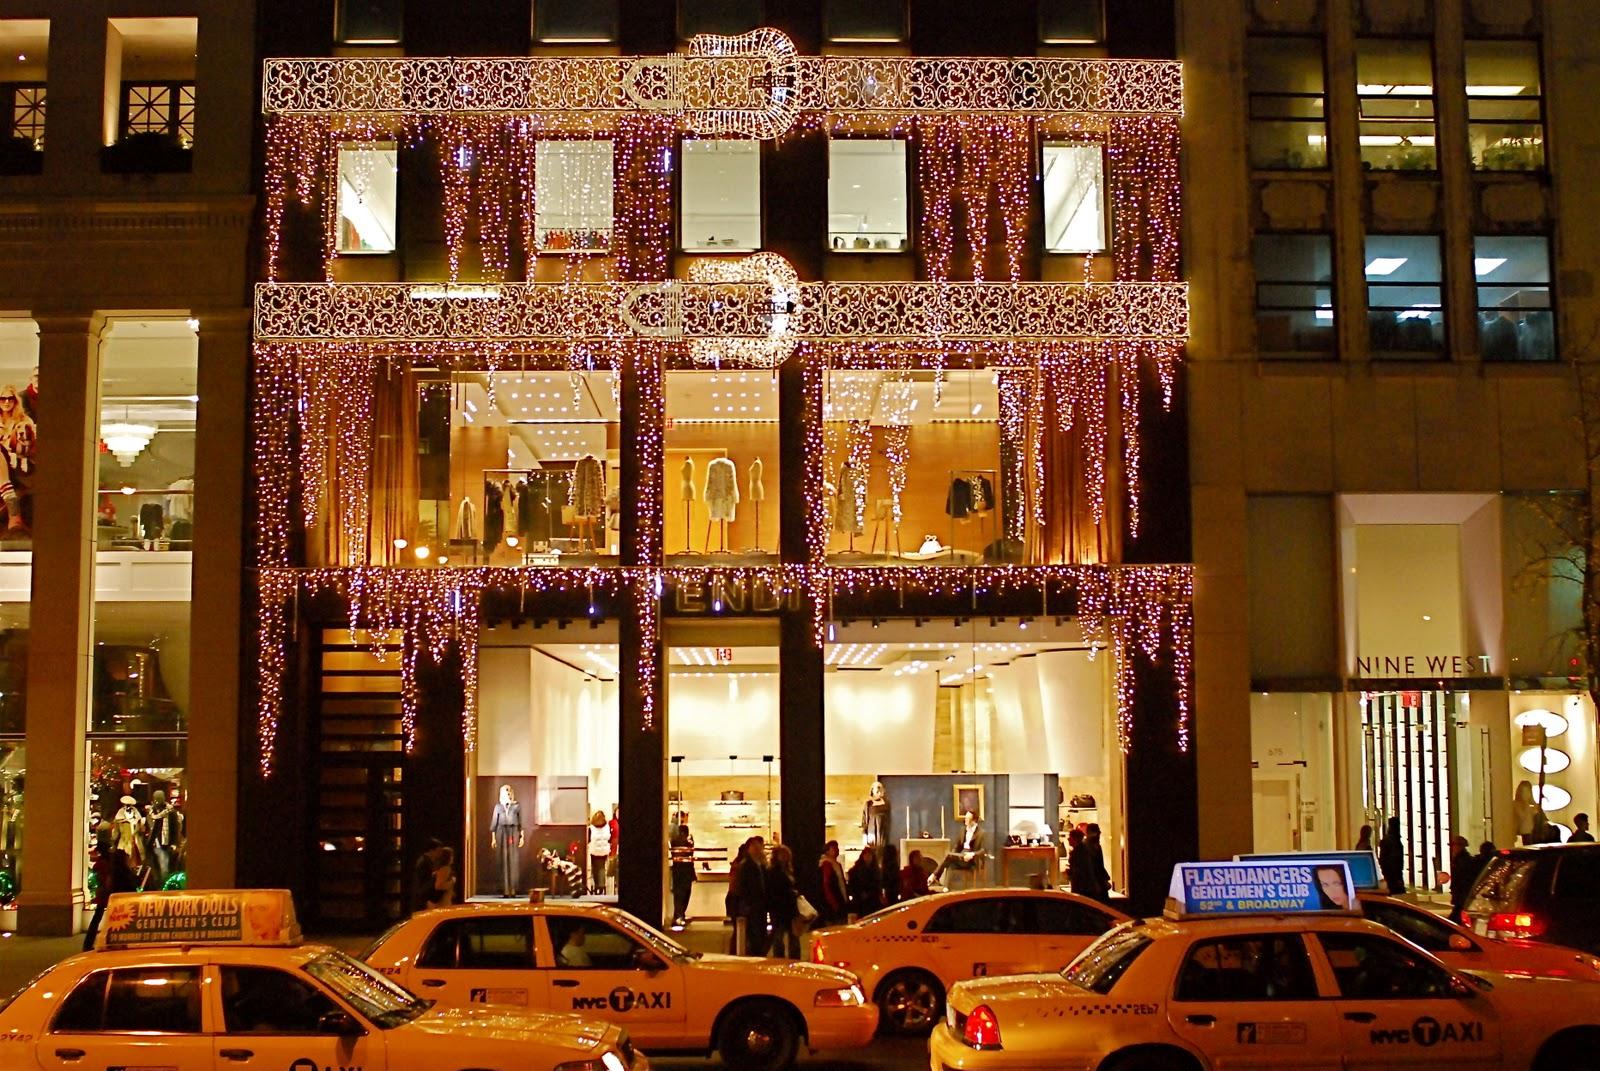 NYC ♥ NYC: Fifth Avenue Christmas Holiday Window Displays: FENDI